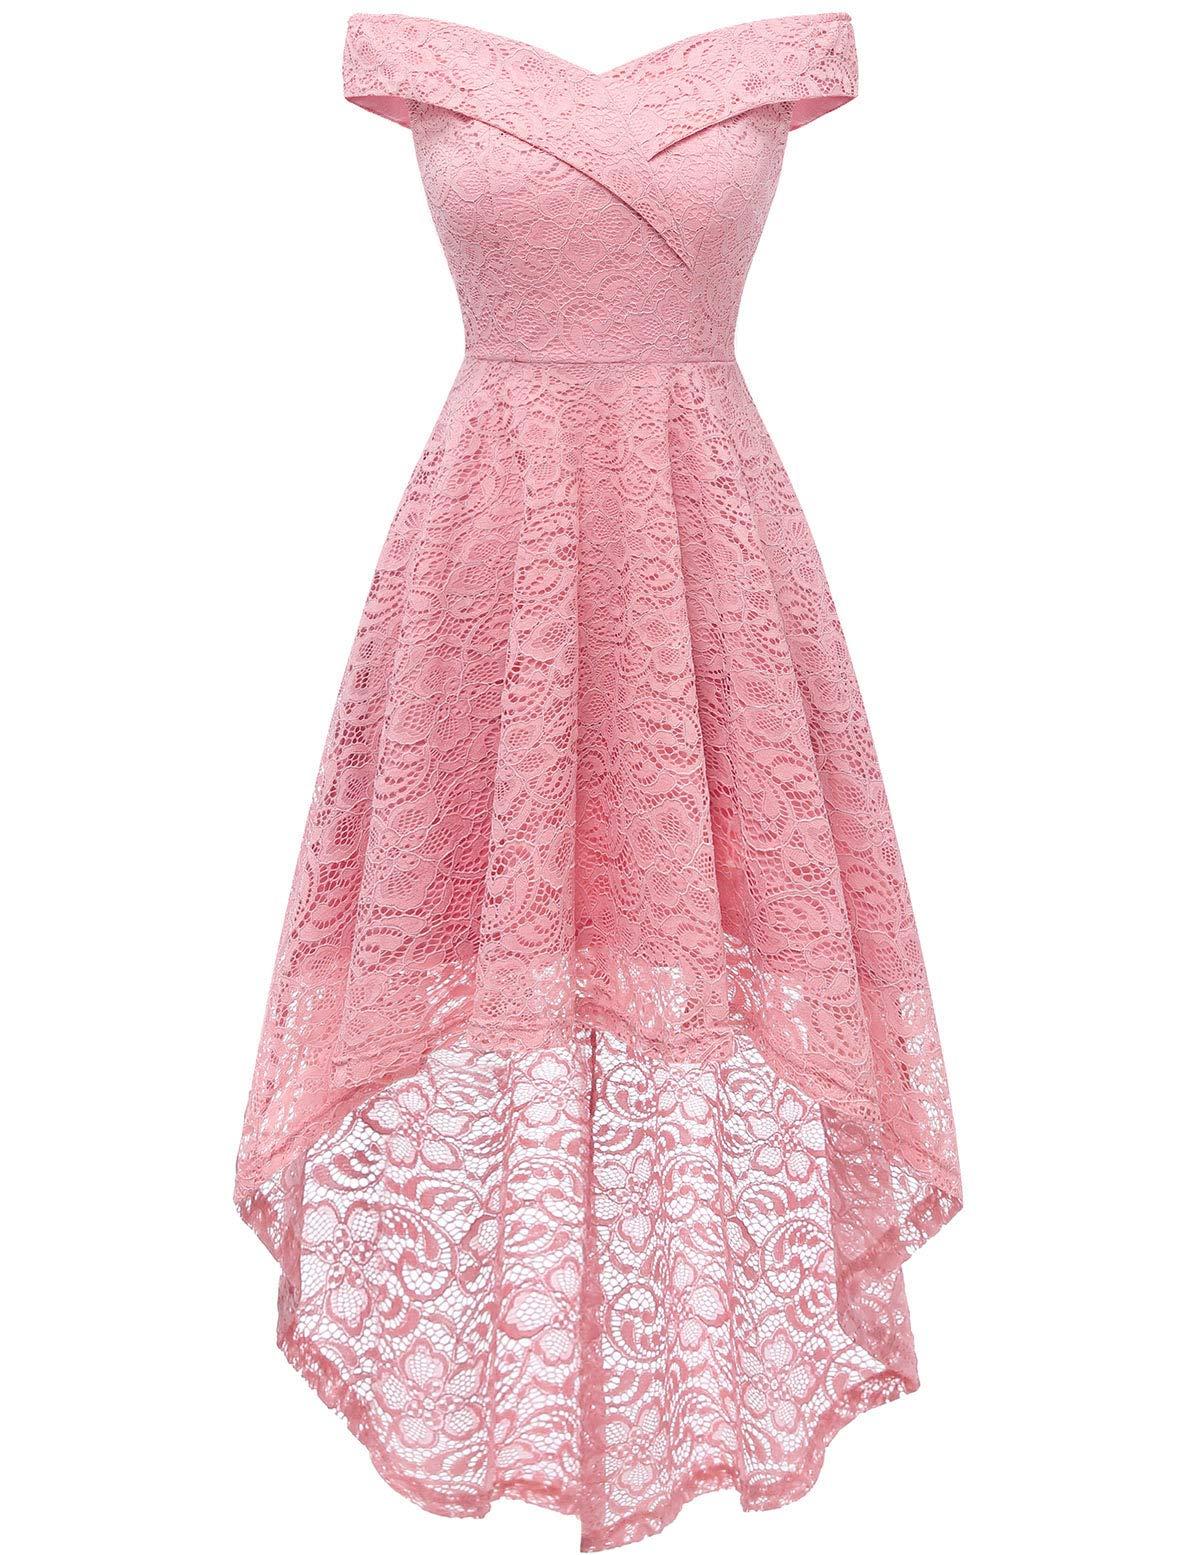 Homrain Women's Vintage Floral Lace Off Shoulder Hi-Lo Wedding Cocktail Formal Swing Dress Plus Size